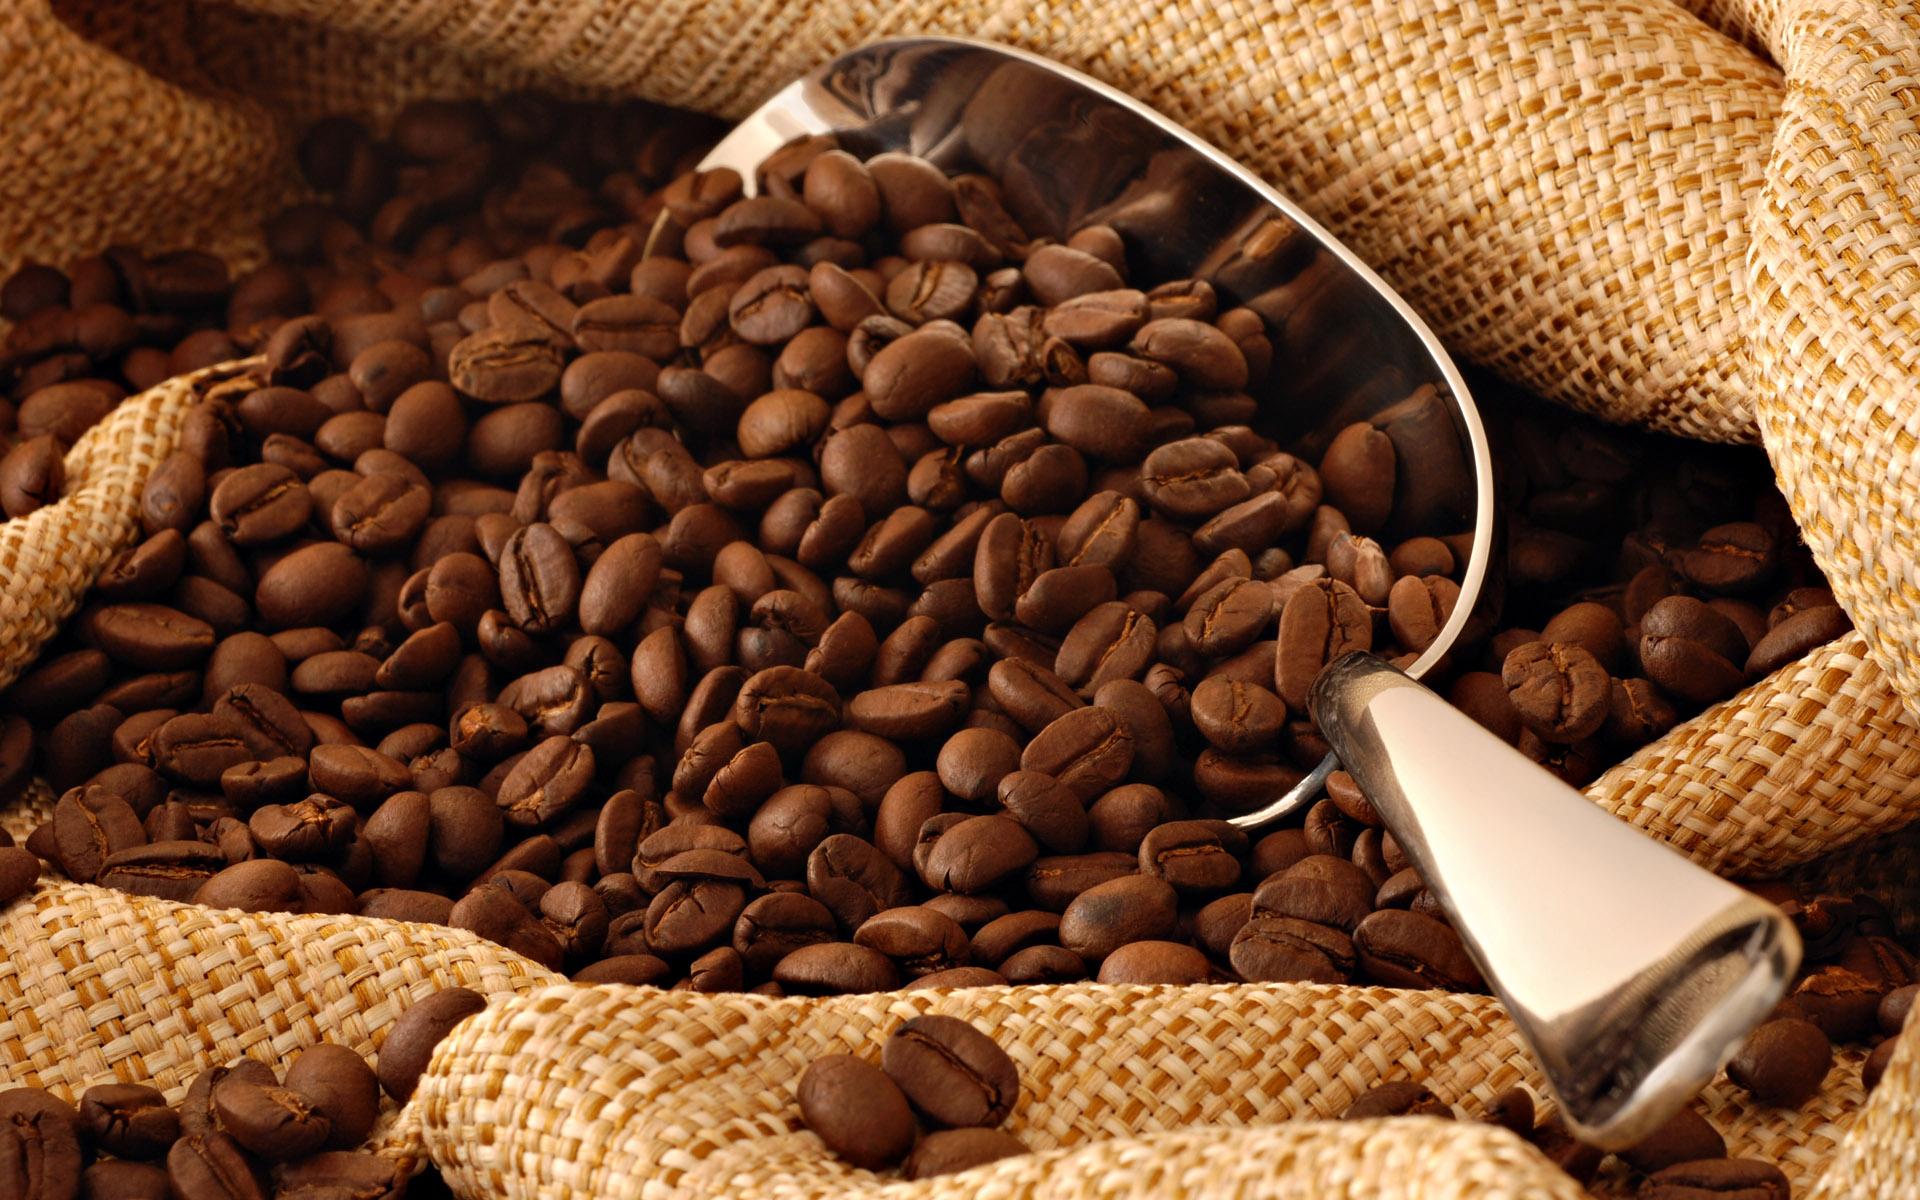 Kopi_Luwak_Coffee1.jpg